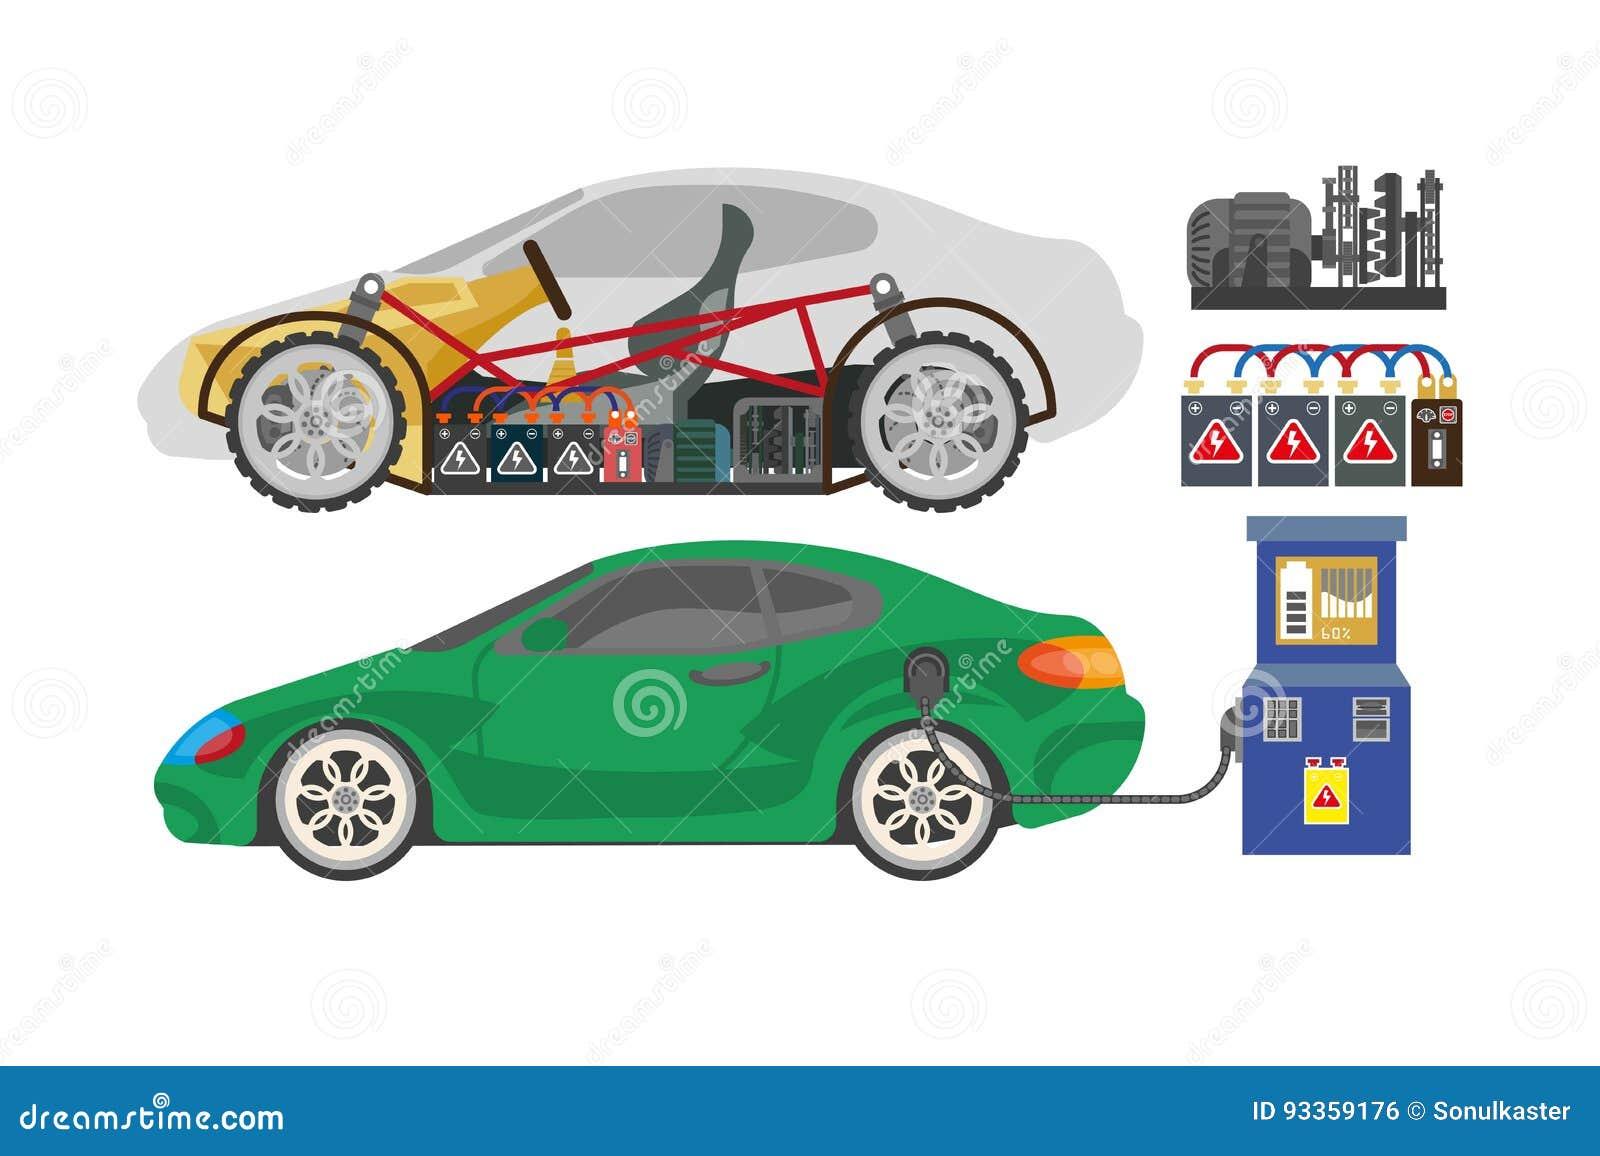 Electrocar Or Electric Car Automobile Vehicle Mechanism Details Vector Flat Design Stock Vector Illustration Of Mechanics Part 93359176